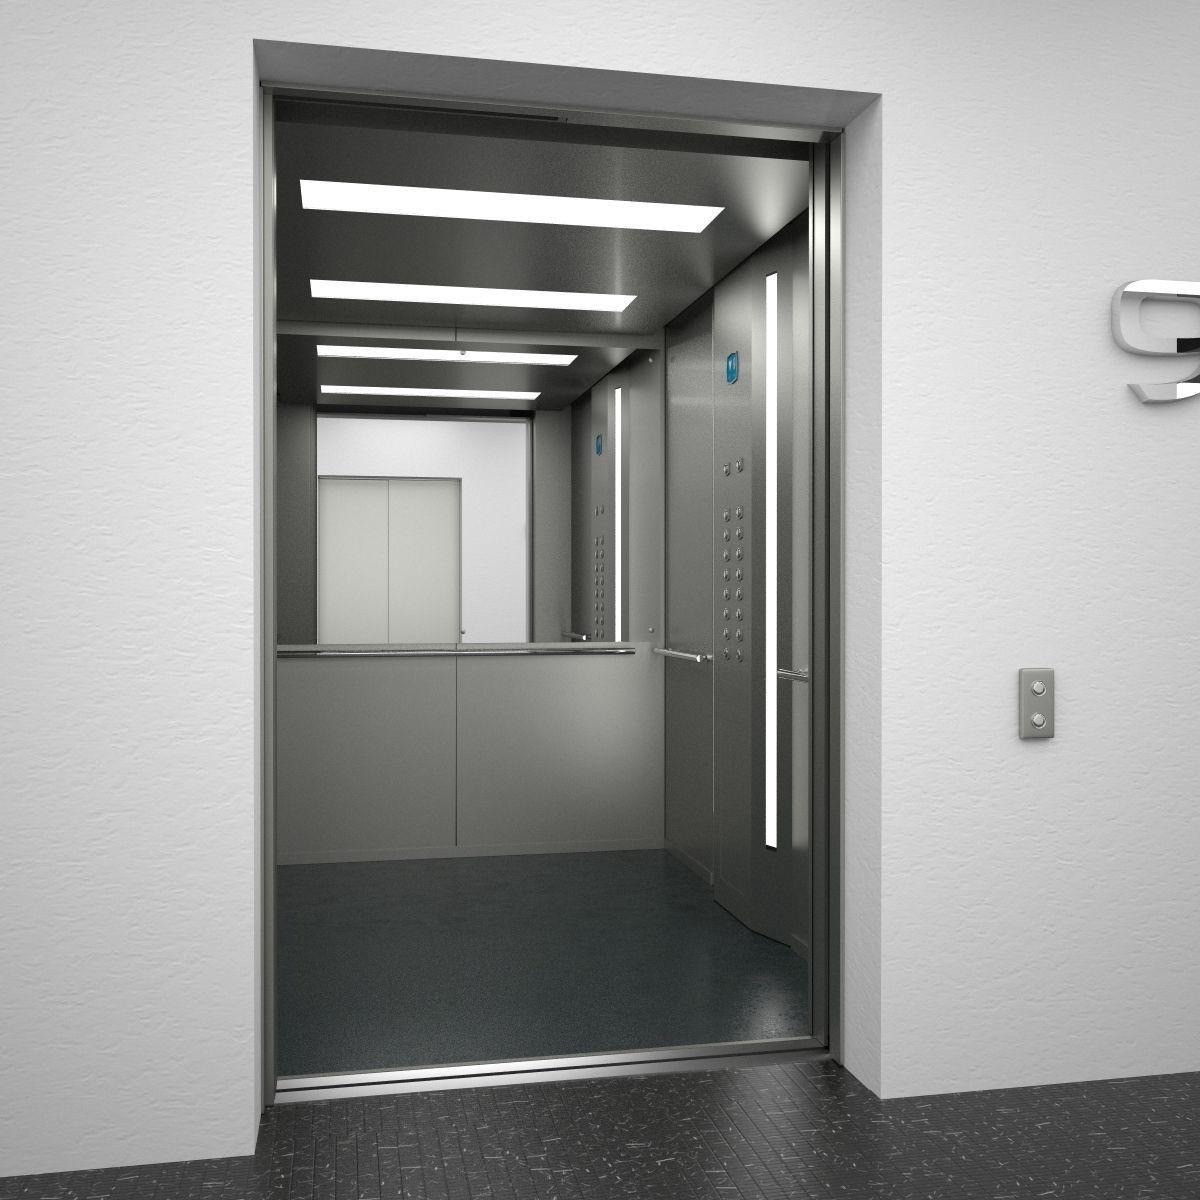 elevator-otis-3d-model-low-poly-animated-max.jpg